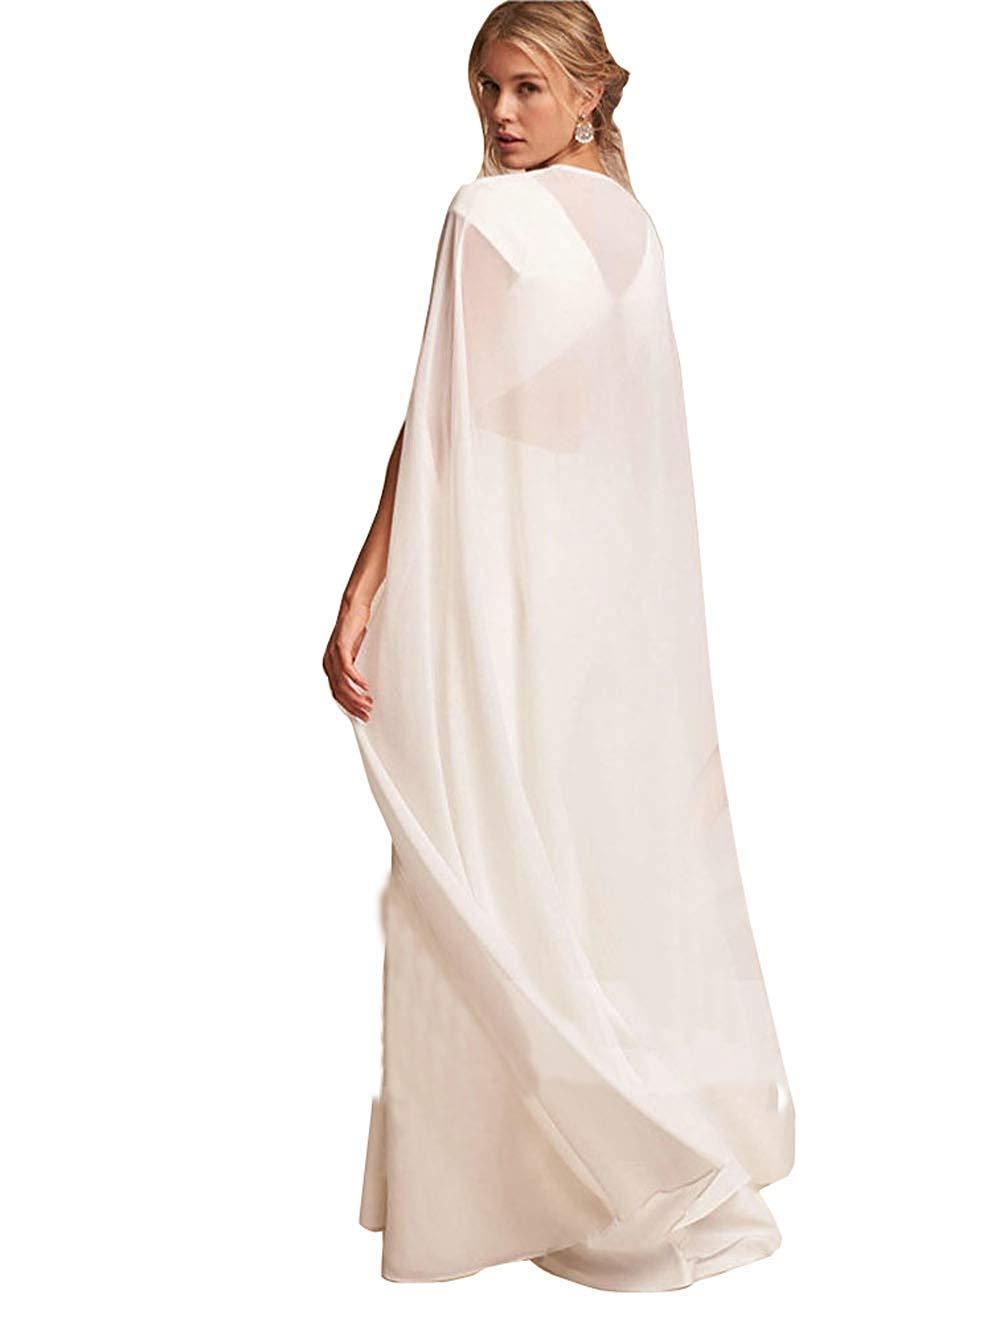 Bridal Wedding Capes Veils Chiffon Bridal Wraps Cathedral Length Wedding Cloak with Arm Hole